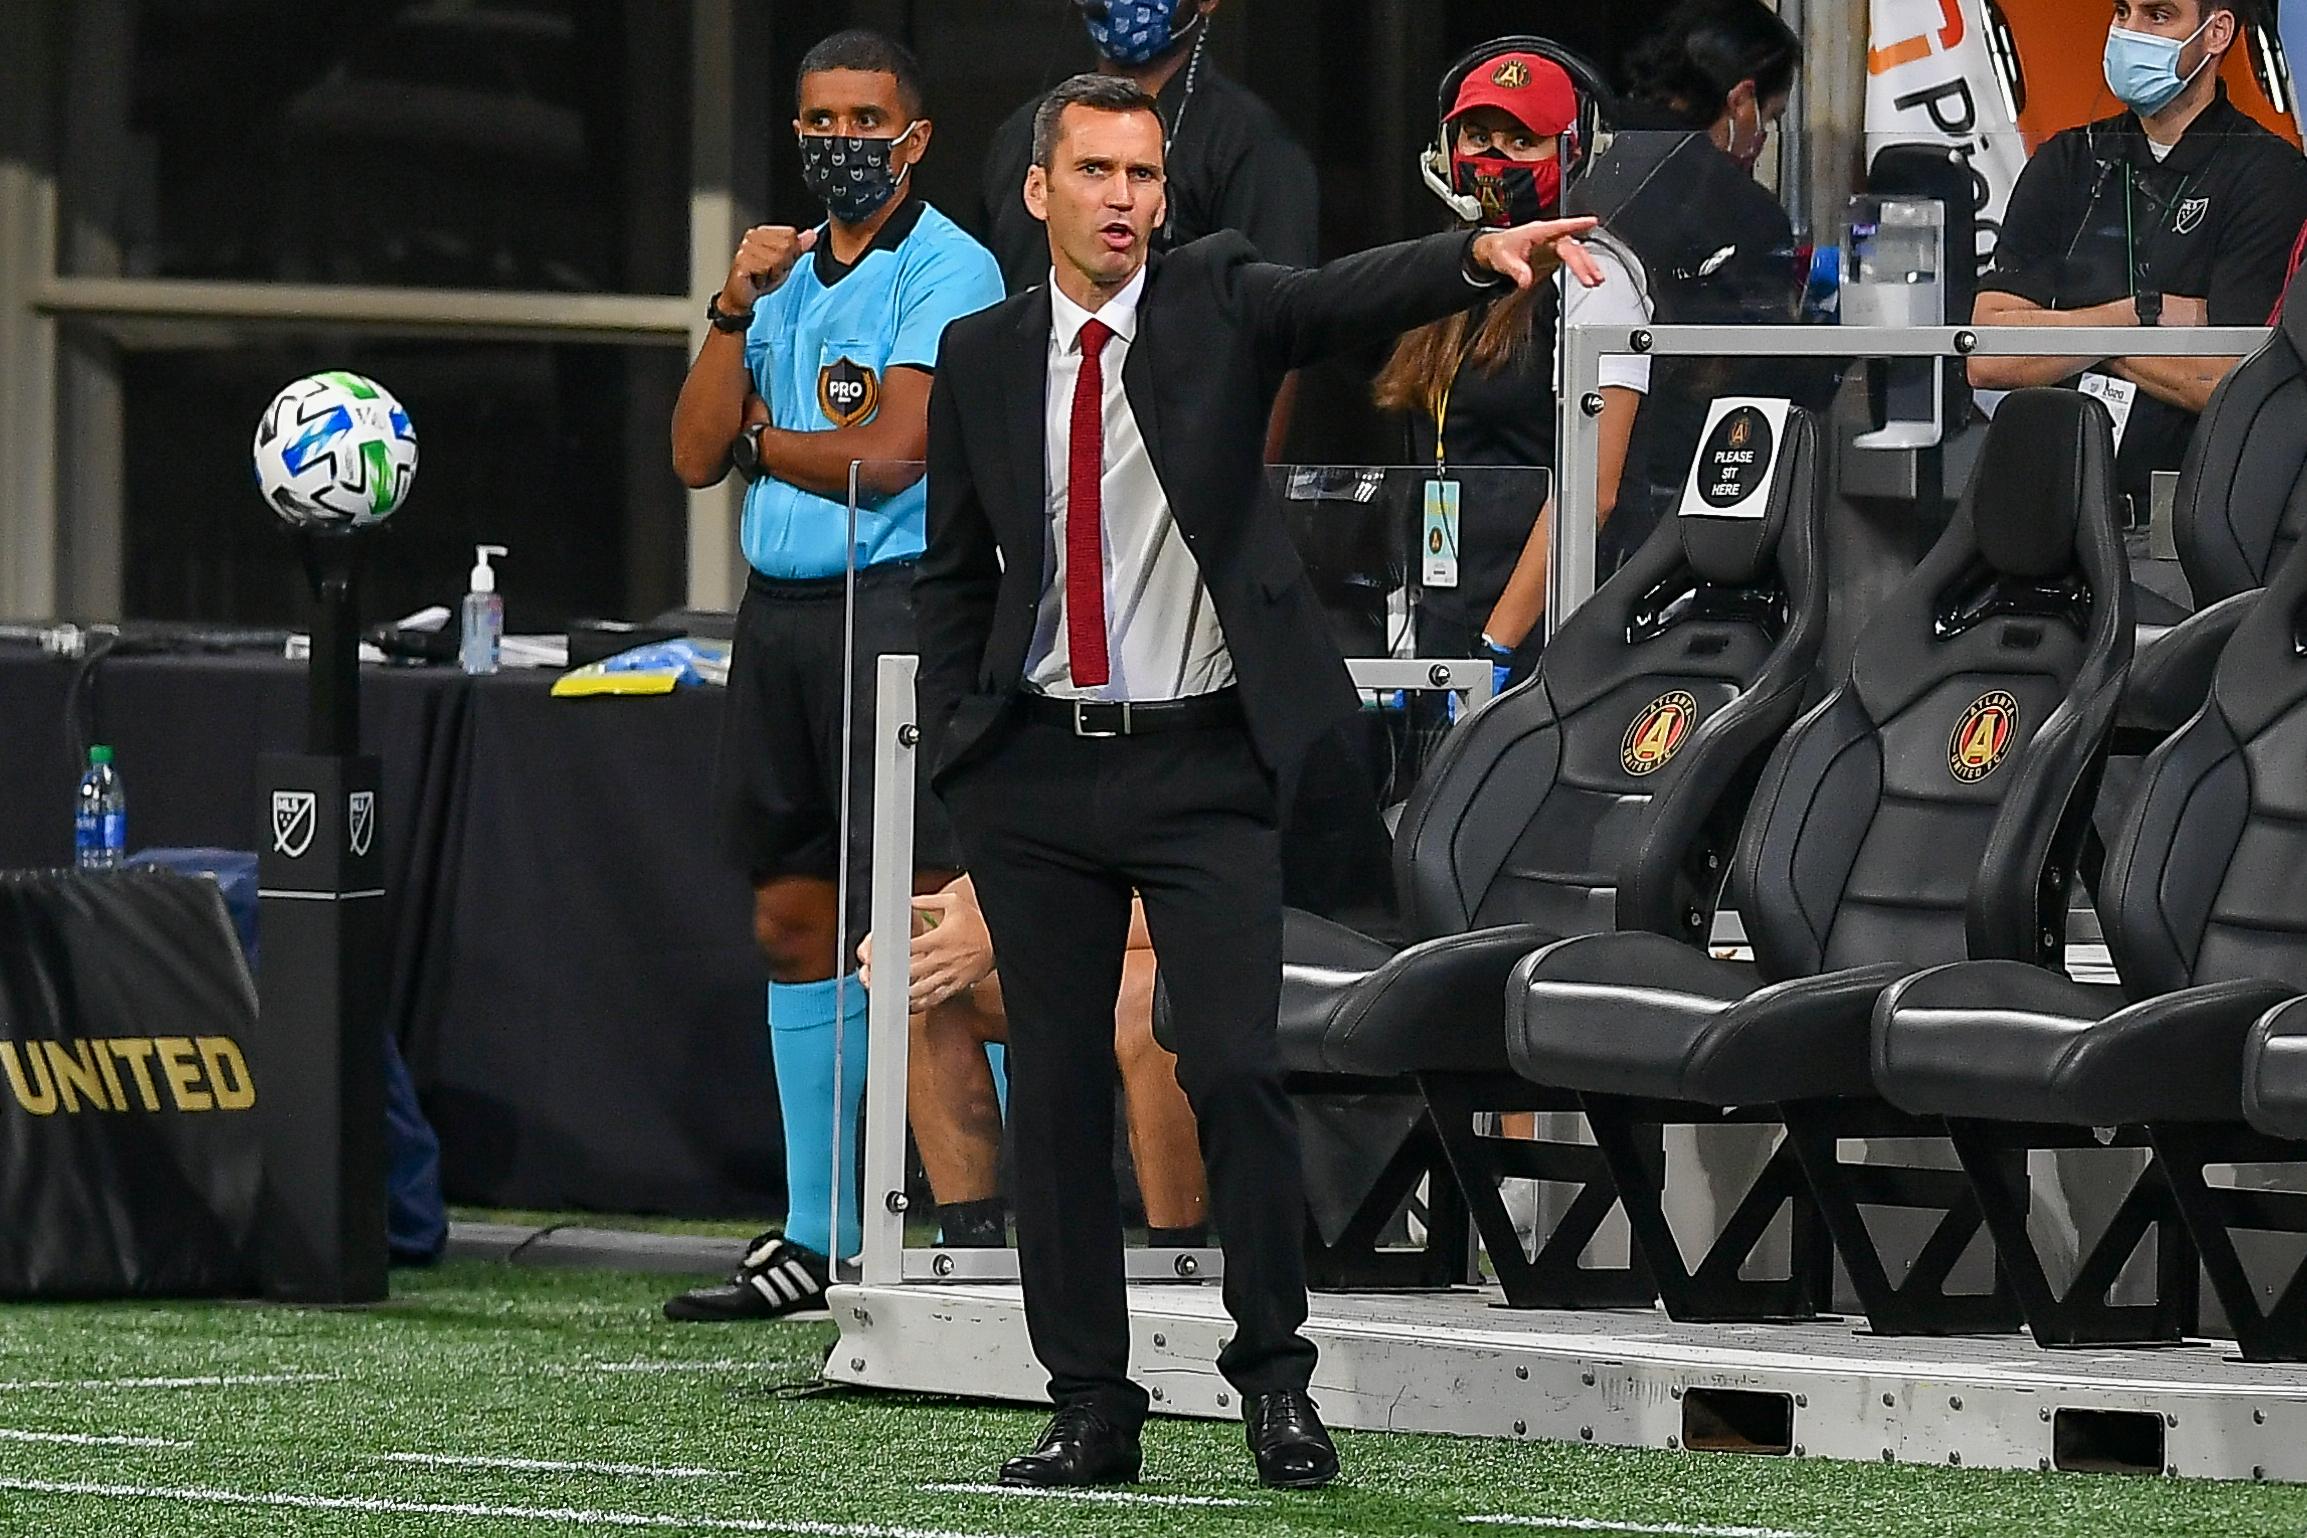 SOCCER: AUG 29 MLS Orlando City SC at Atlanta United FC